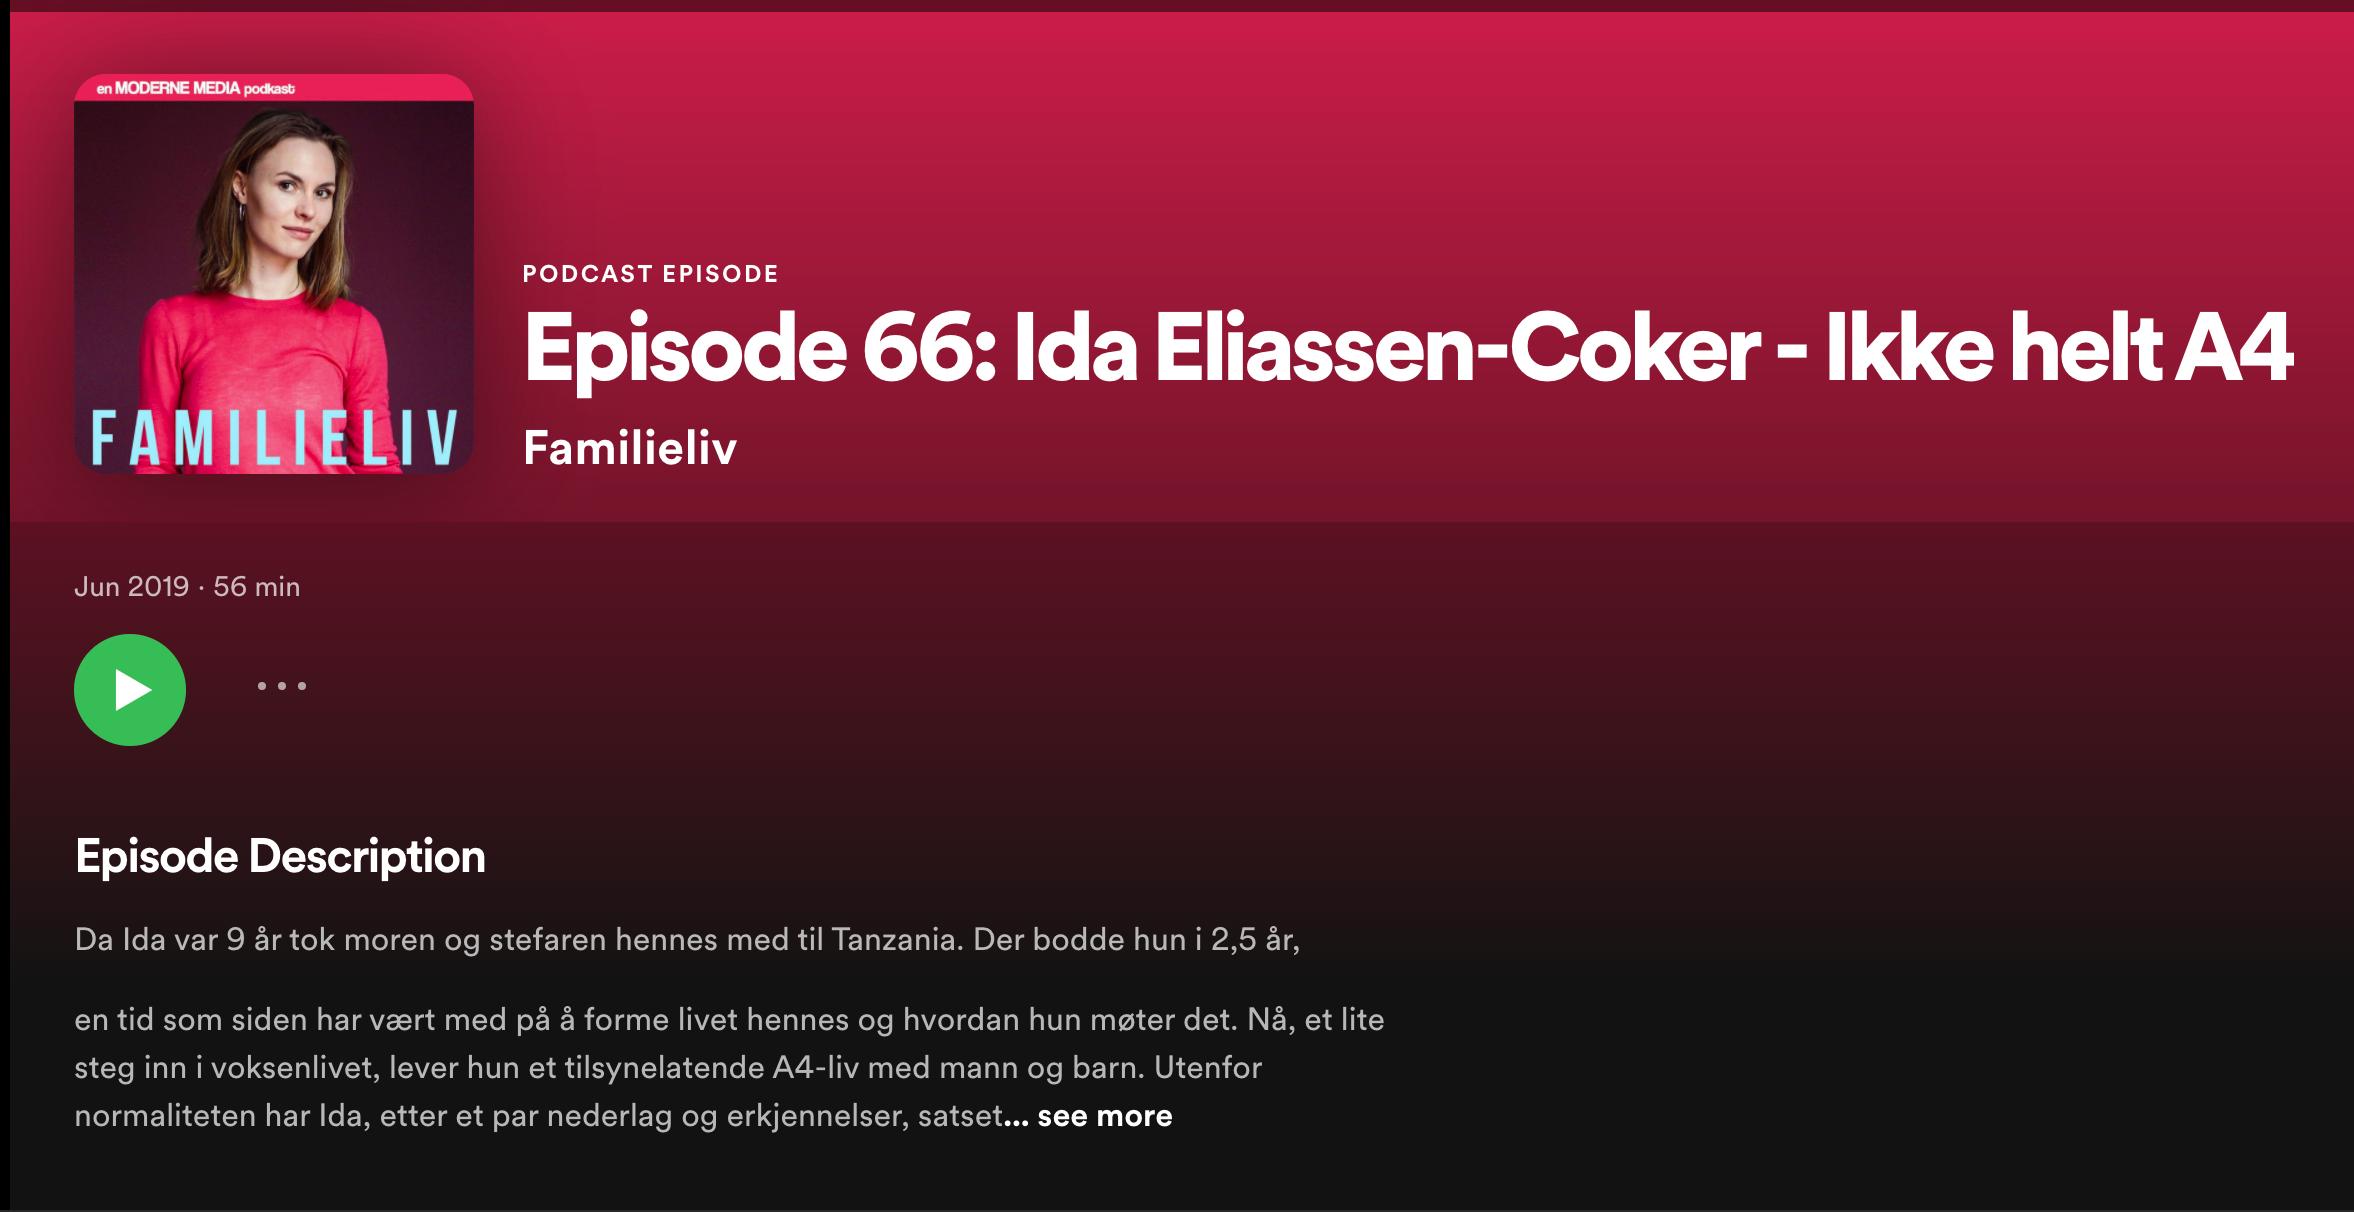 Podcastintervju med Oda Weider-Krog